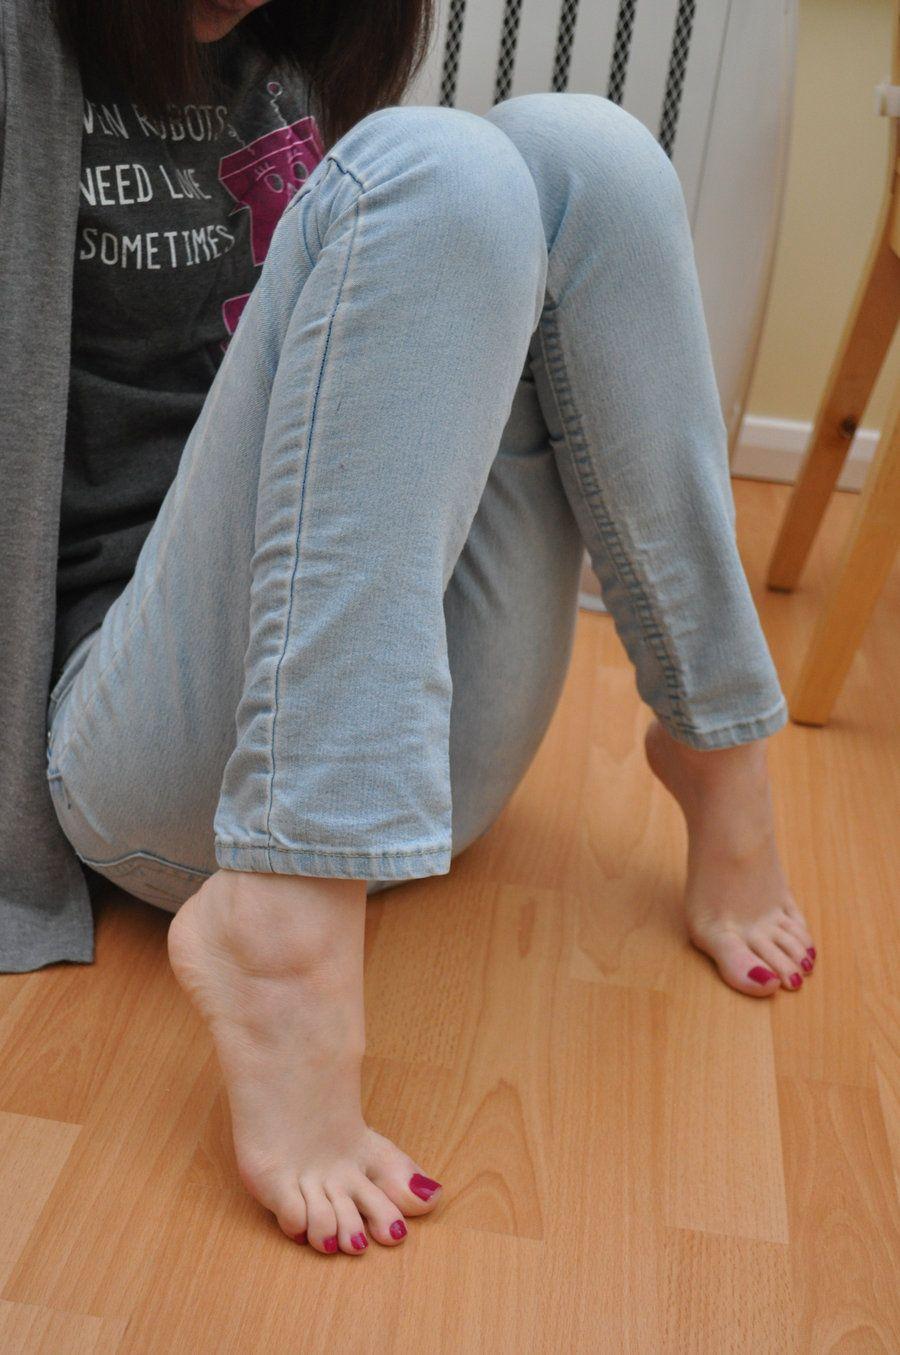 amazing posefoxy-feet.deviantart on @deviantart | adriana